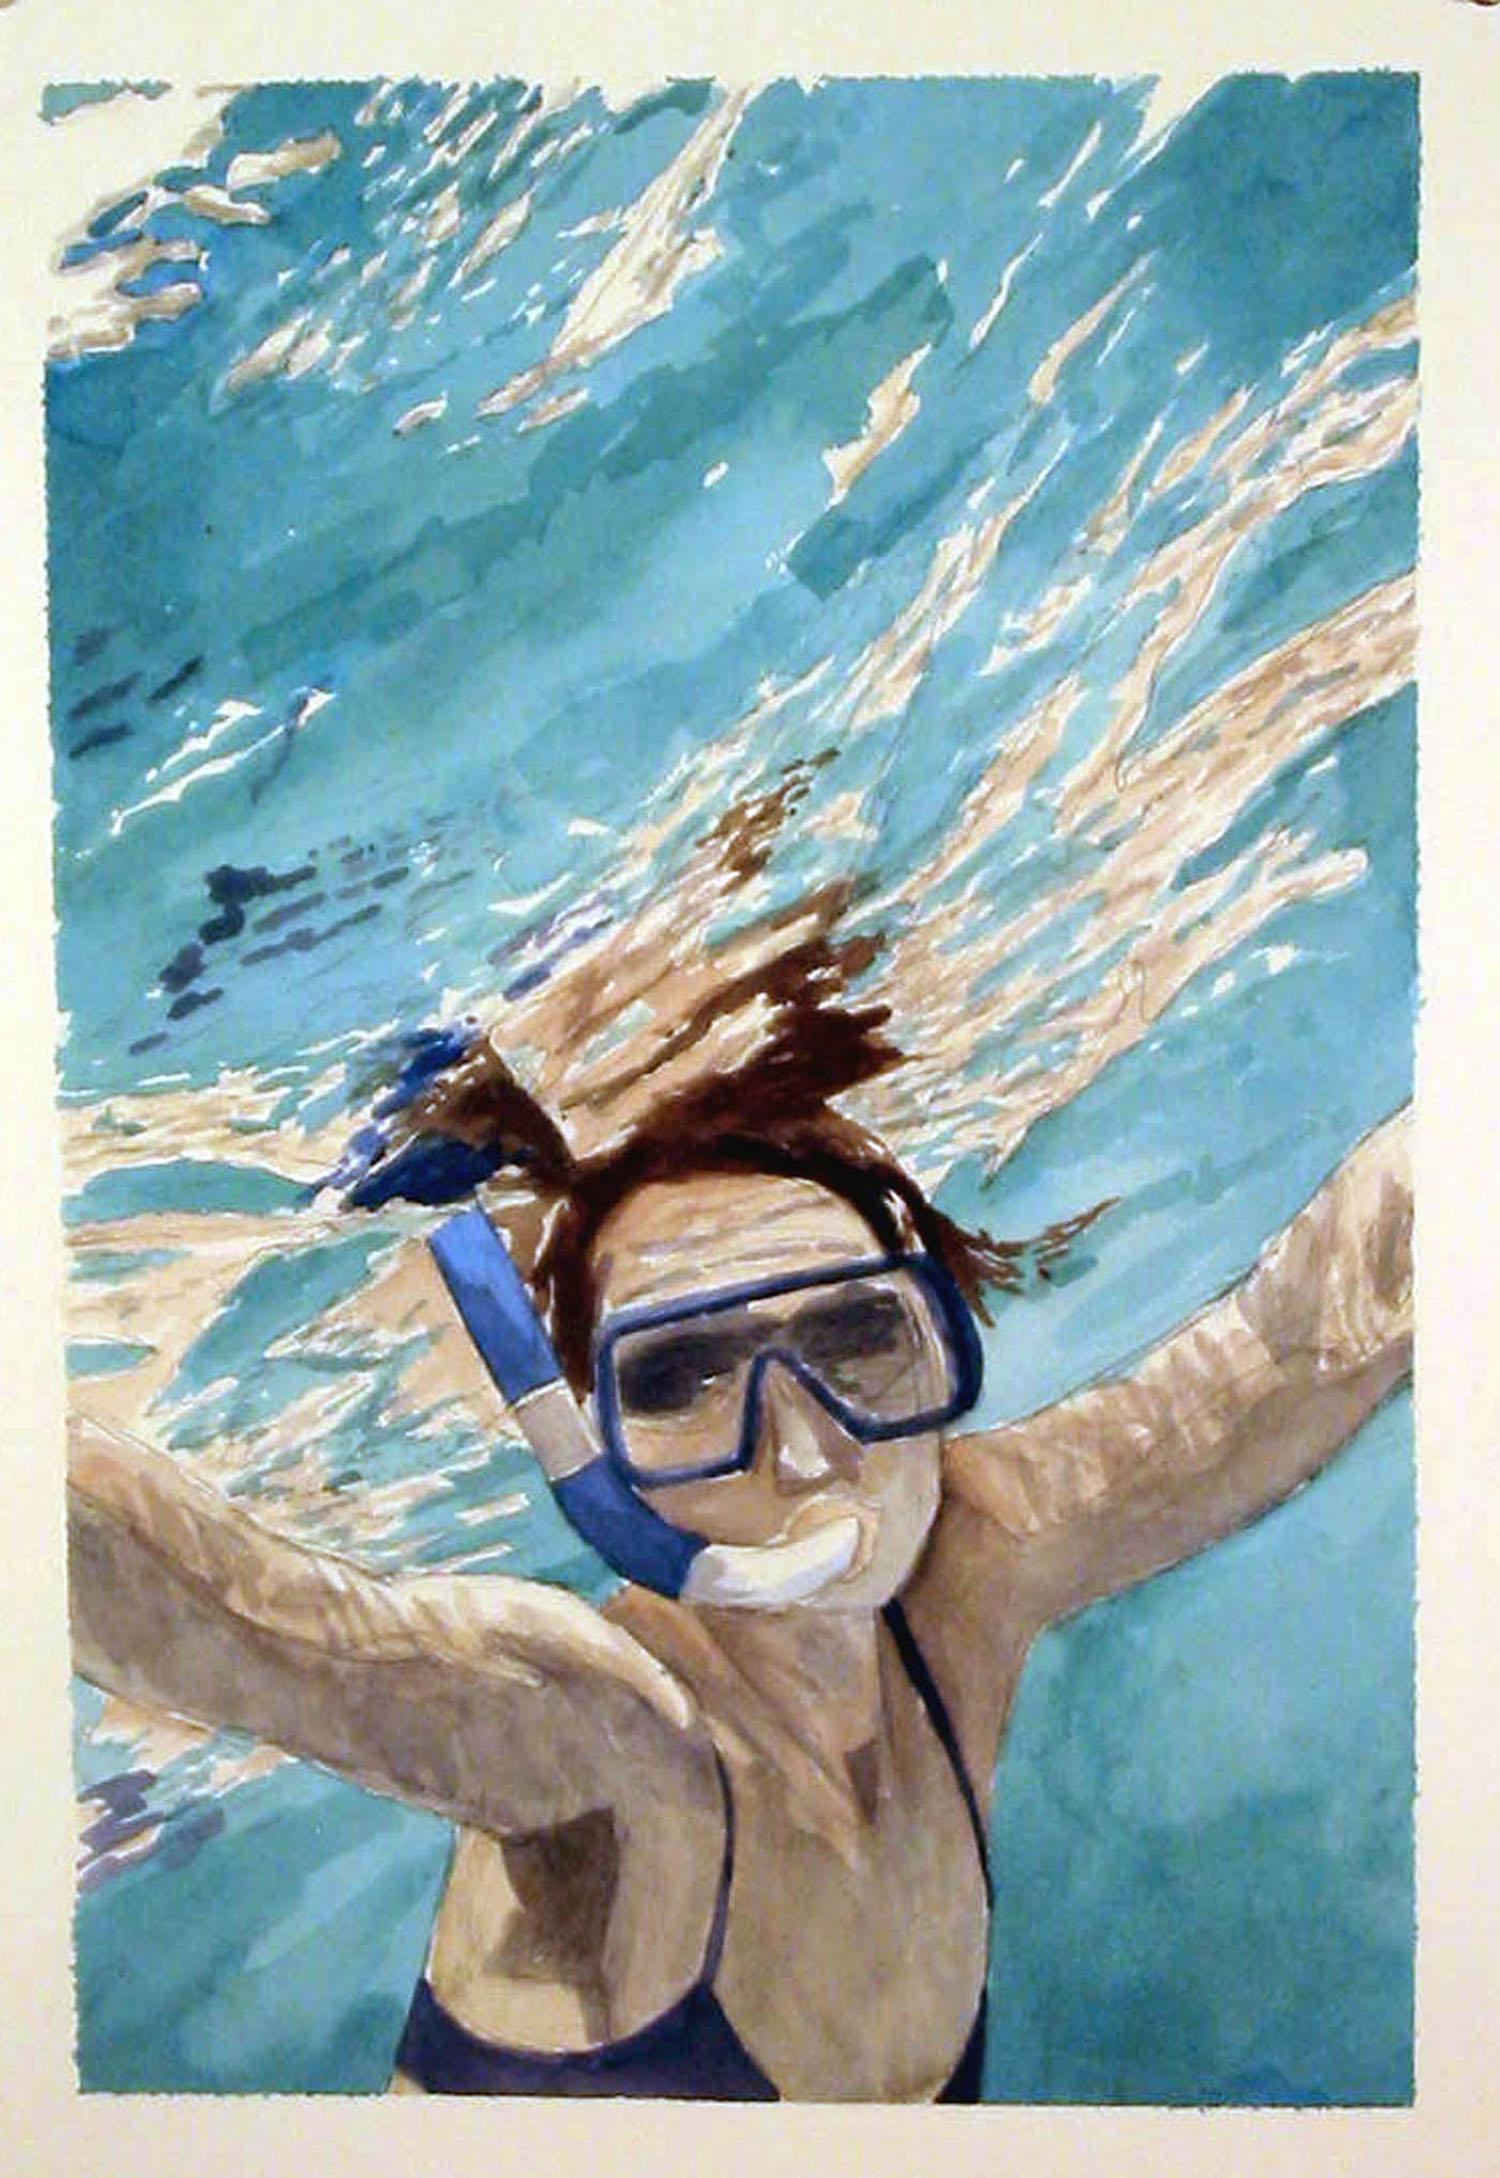 Ramona Snorkeling, 2006, watercolor, 20 x 14 in.